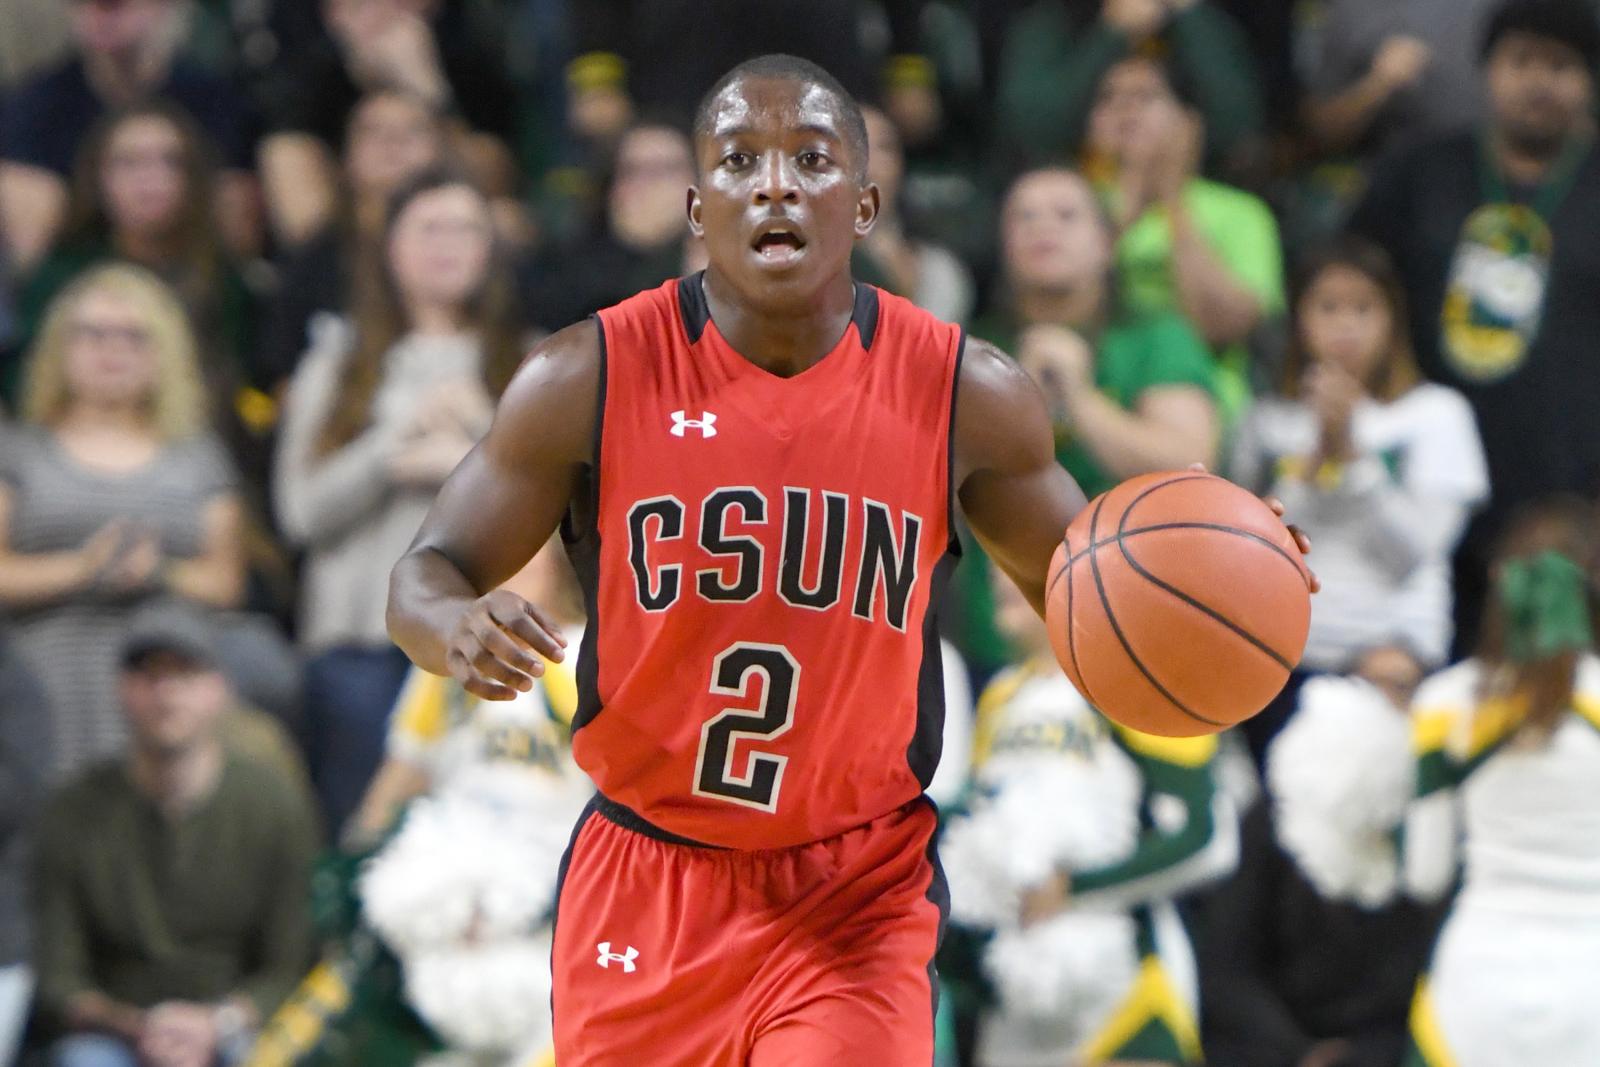 NCAA Basketball Recruiting: Analyzing transfer Terrell Gomez final 4 teams